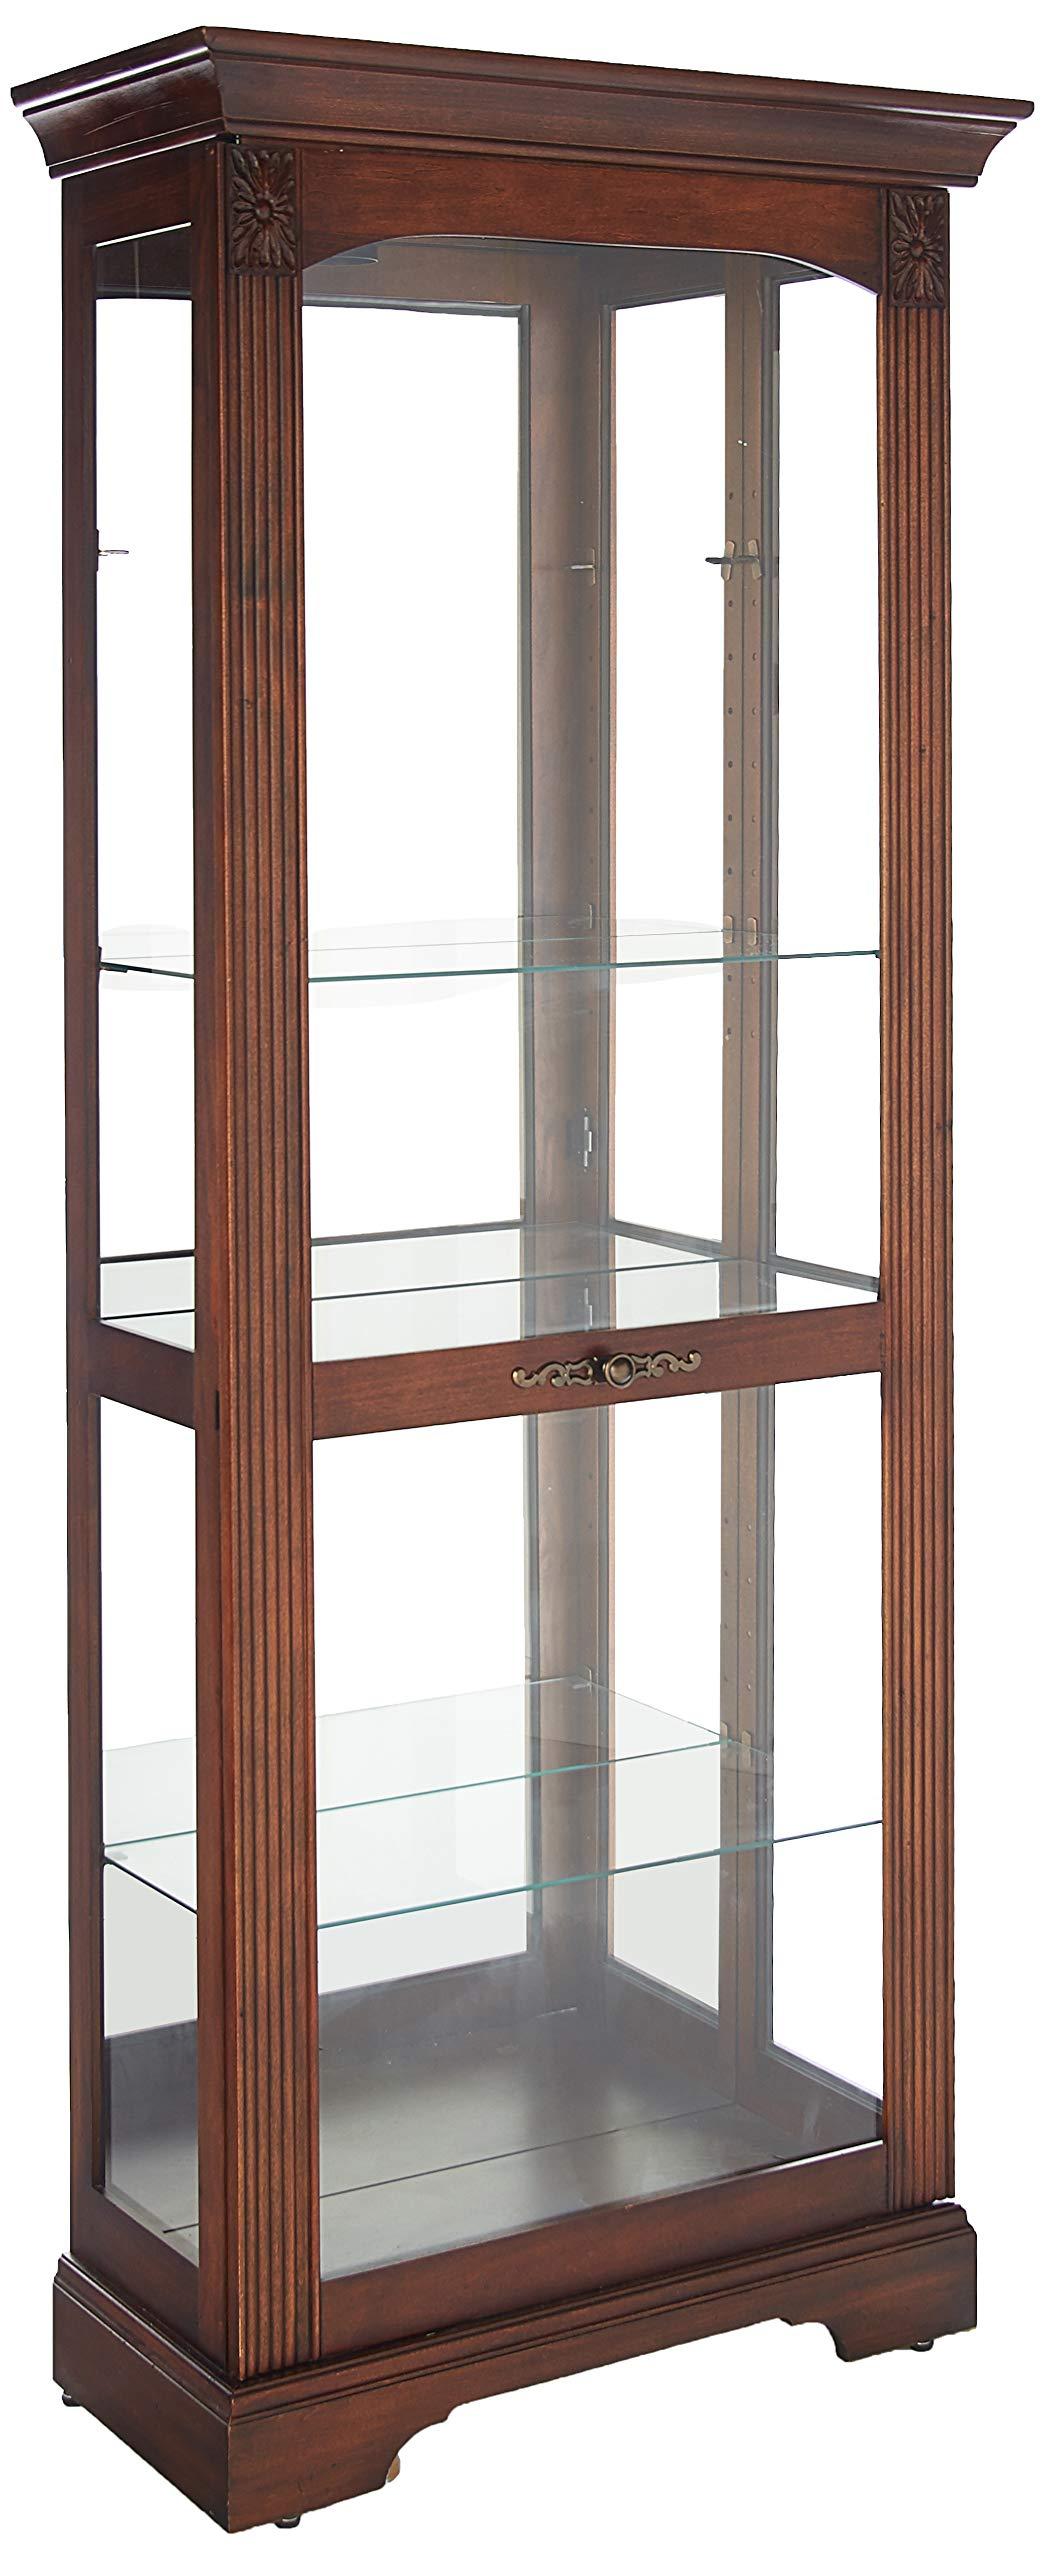 Howard Miller 680-420 Ricardo Curio Cabinet by Howard Miller